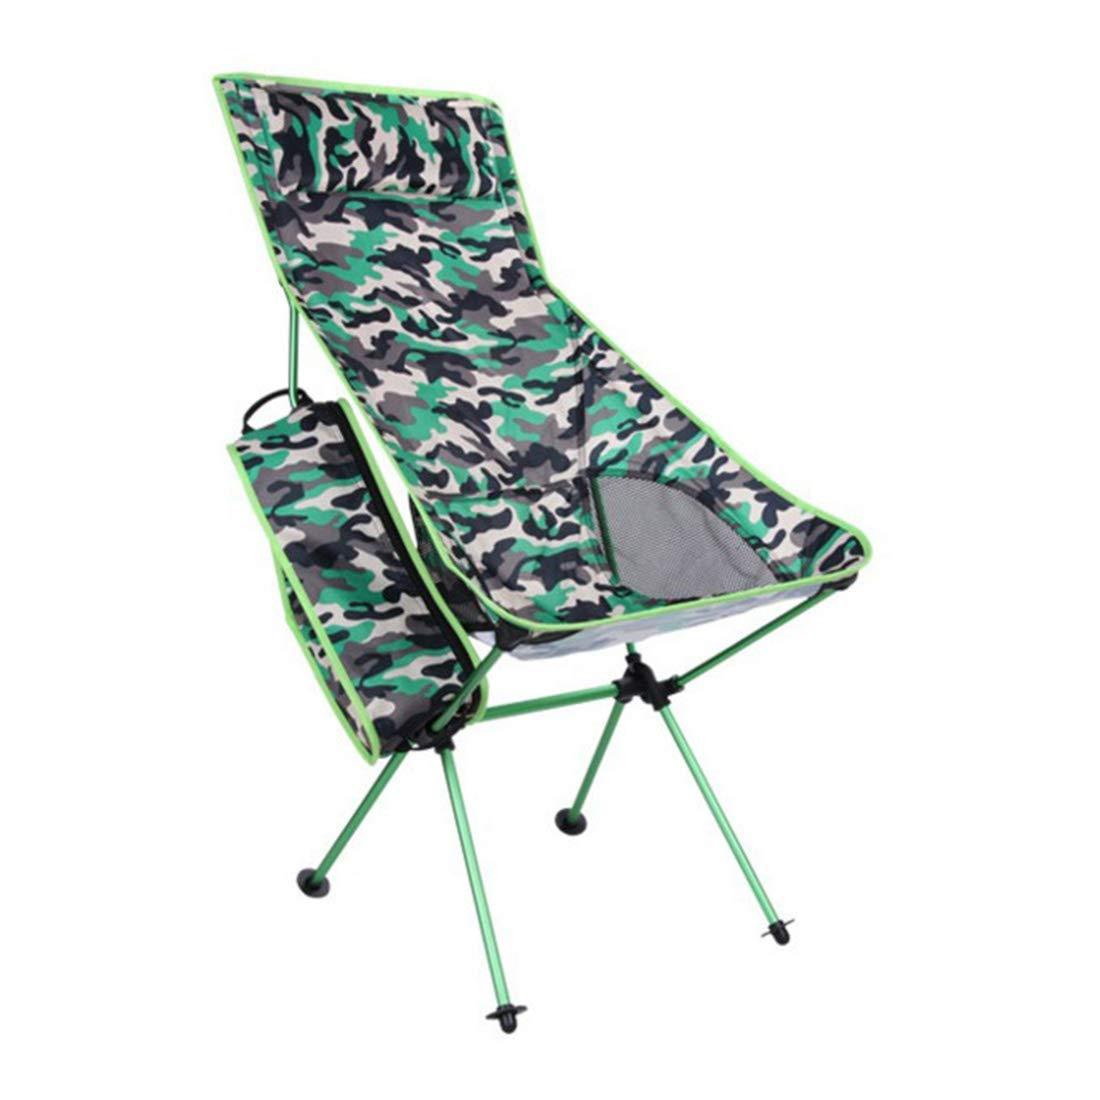 FUBULECY Outdoor Aluminiumlegierung Camo Folding Beach Chair Berg Camping Freizeit Stuhl Lange Klappstuhl